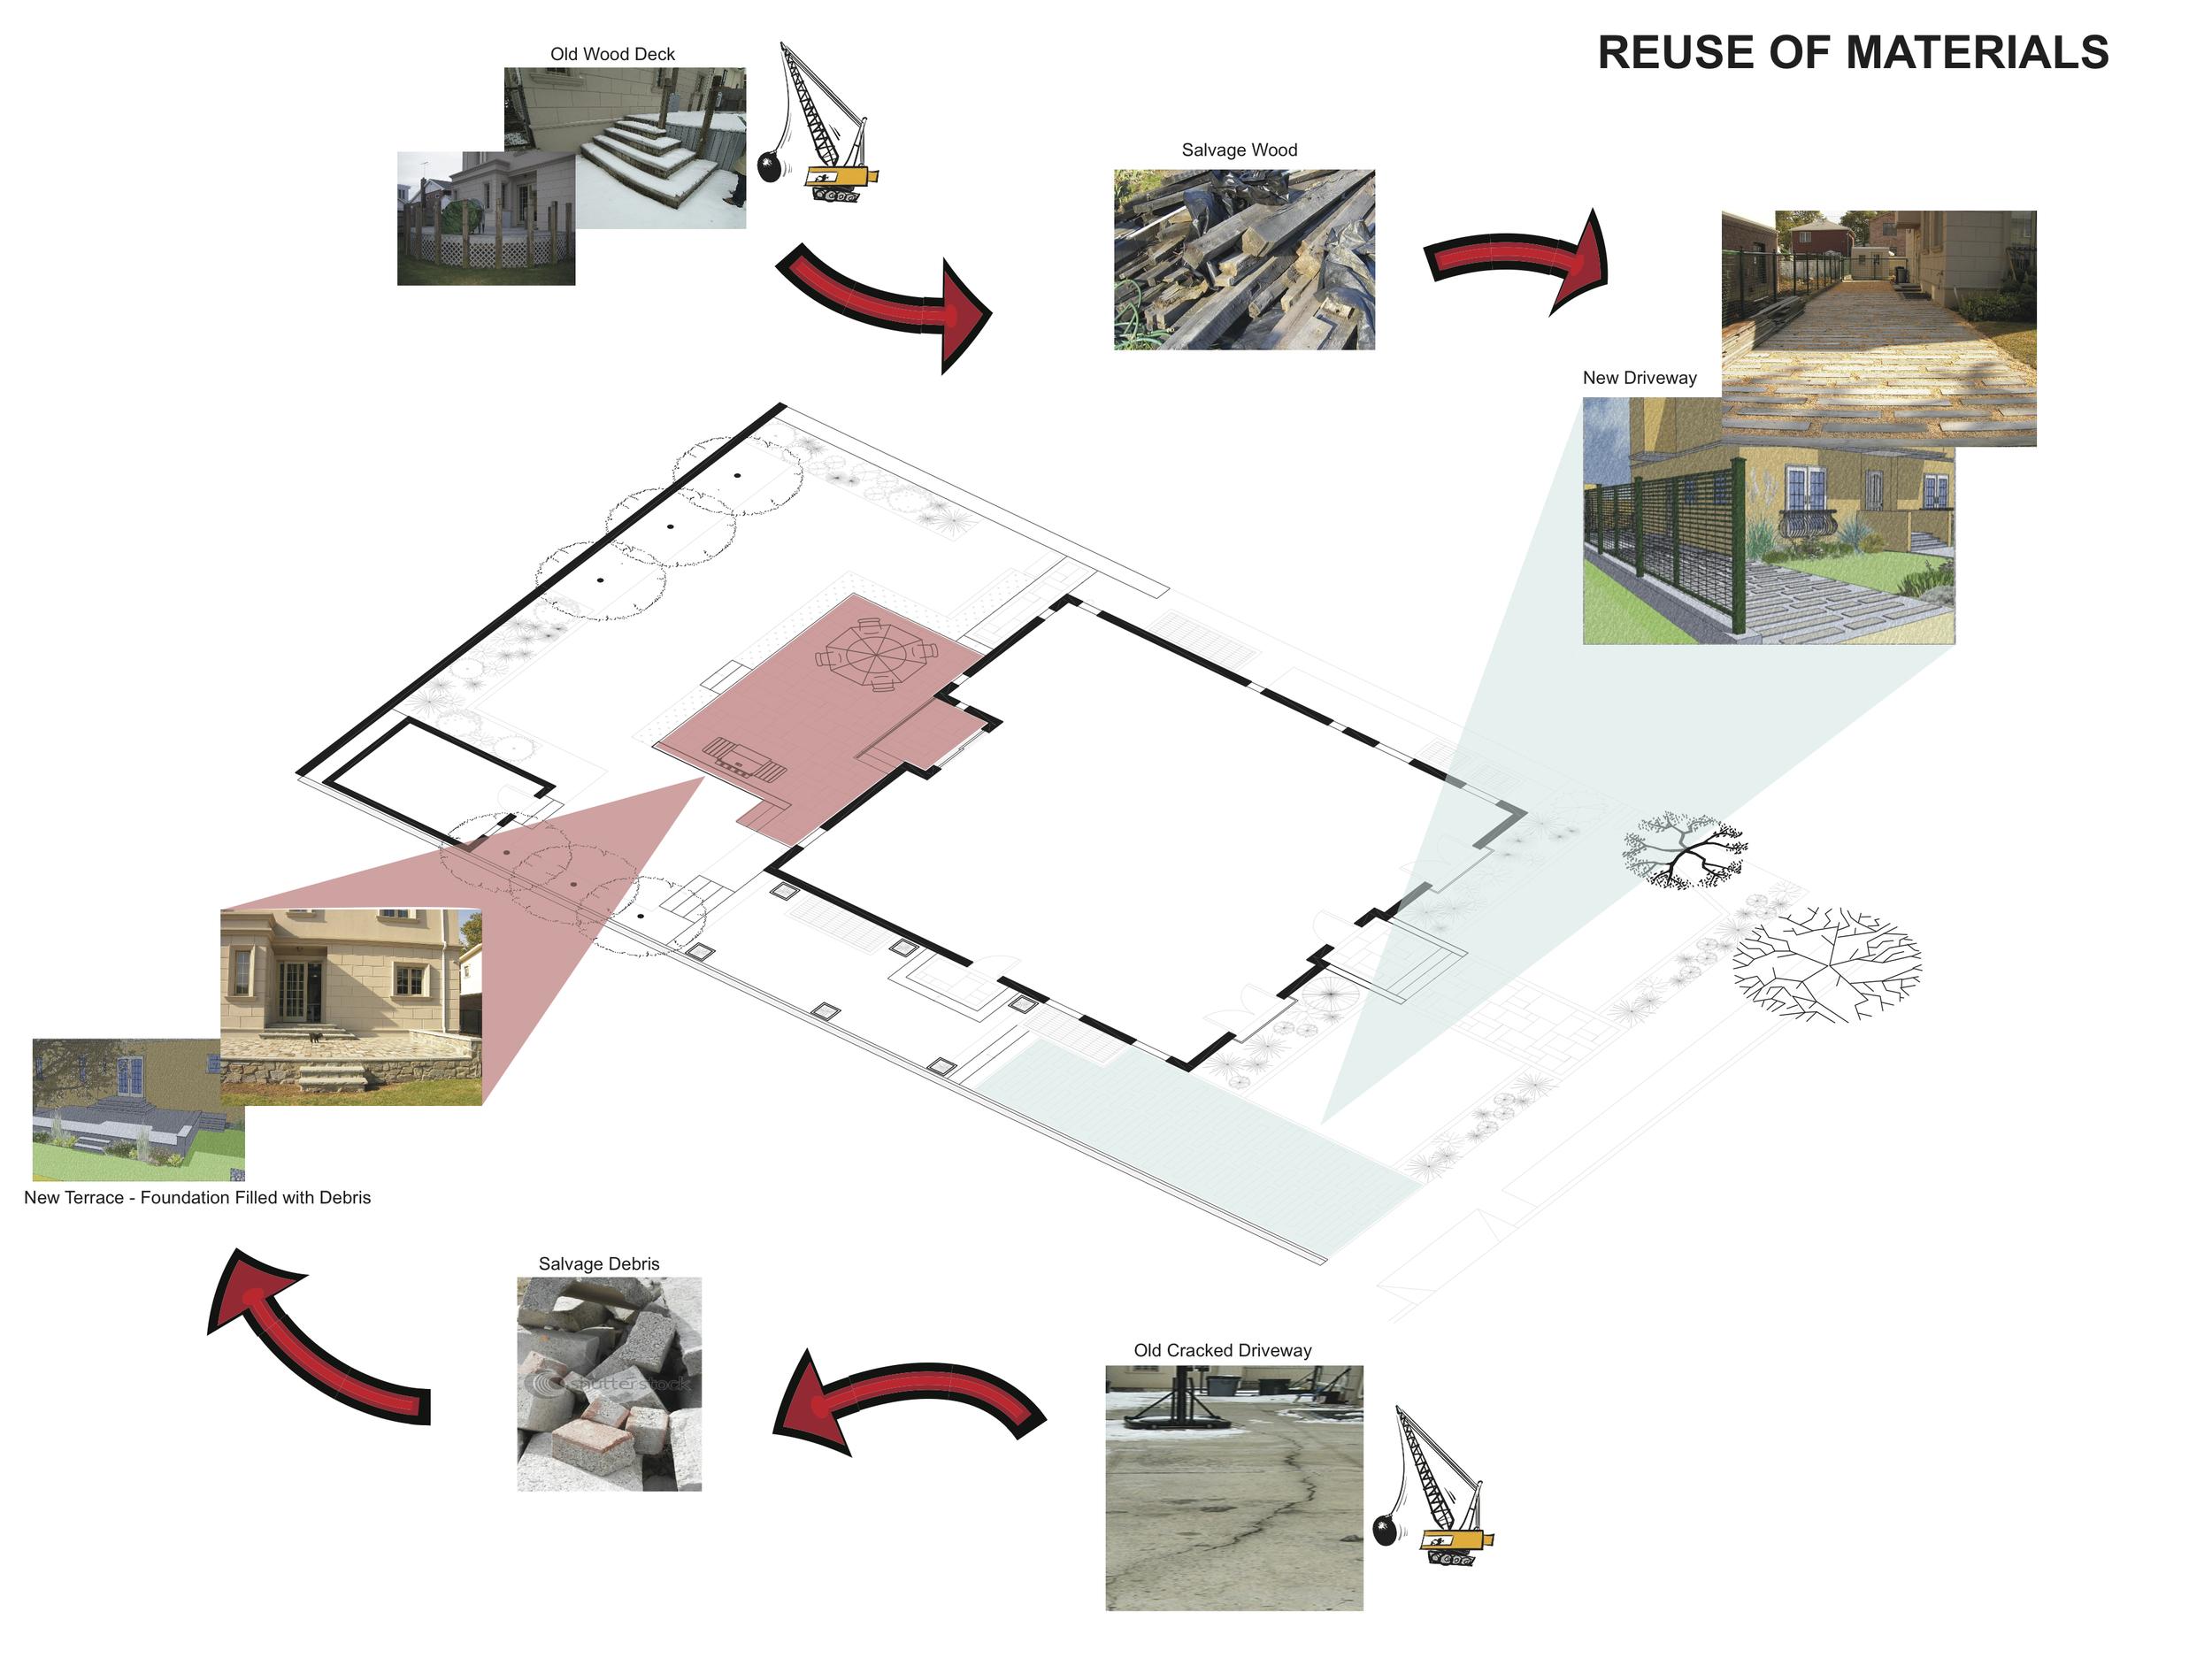 REUSE OF MATERIALS_SCHAIN.jpg